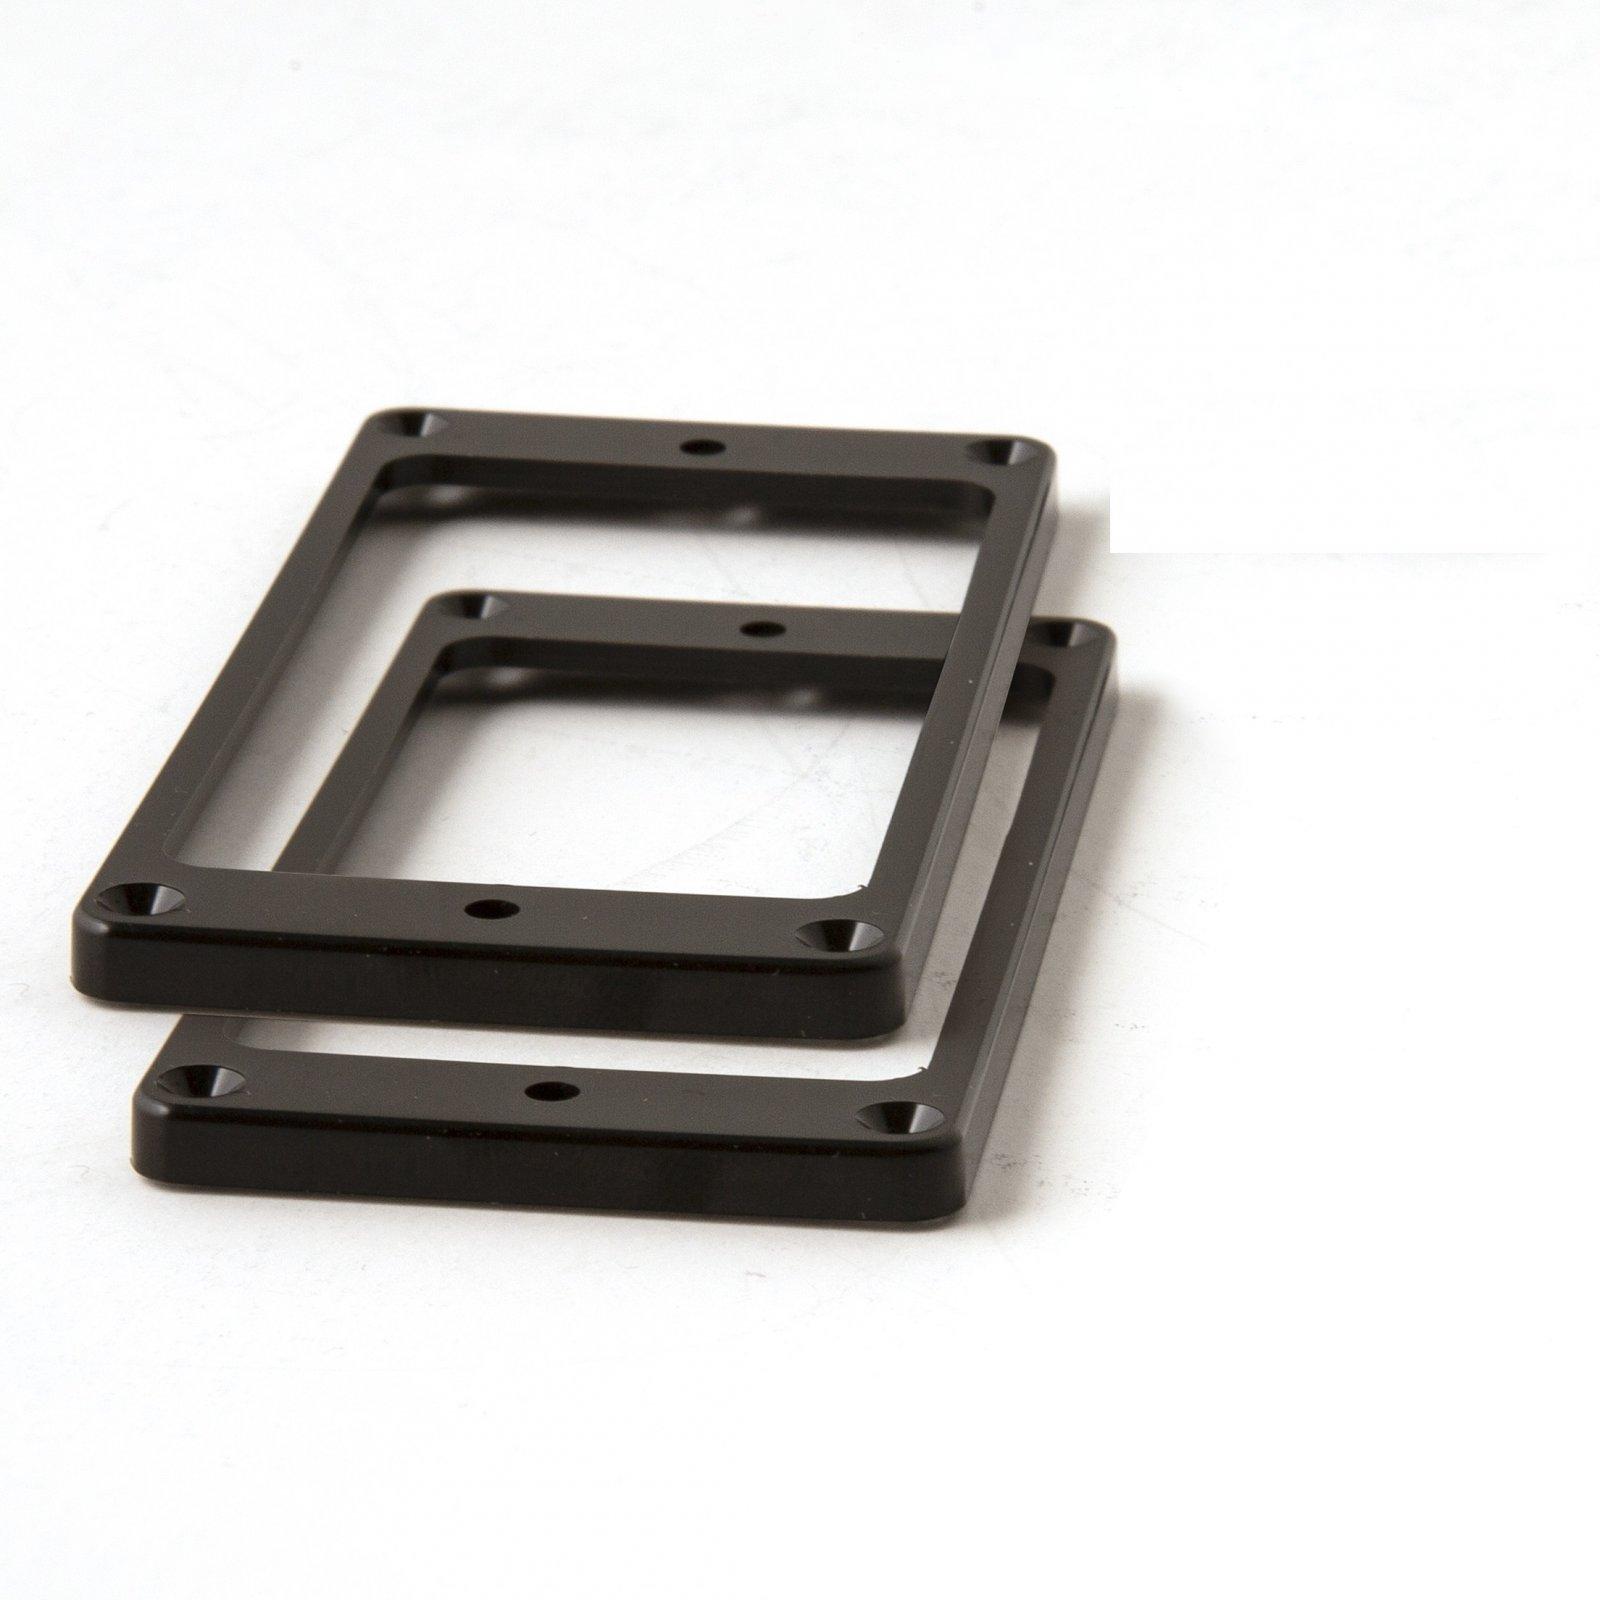 PRS SE Humbucker Pickup Rings (2), Straight, Black (Trem Equipped)